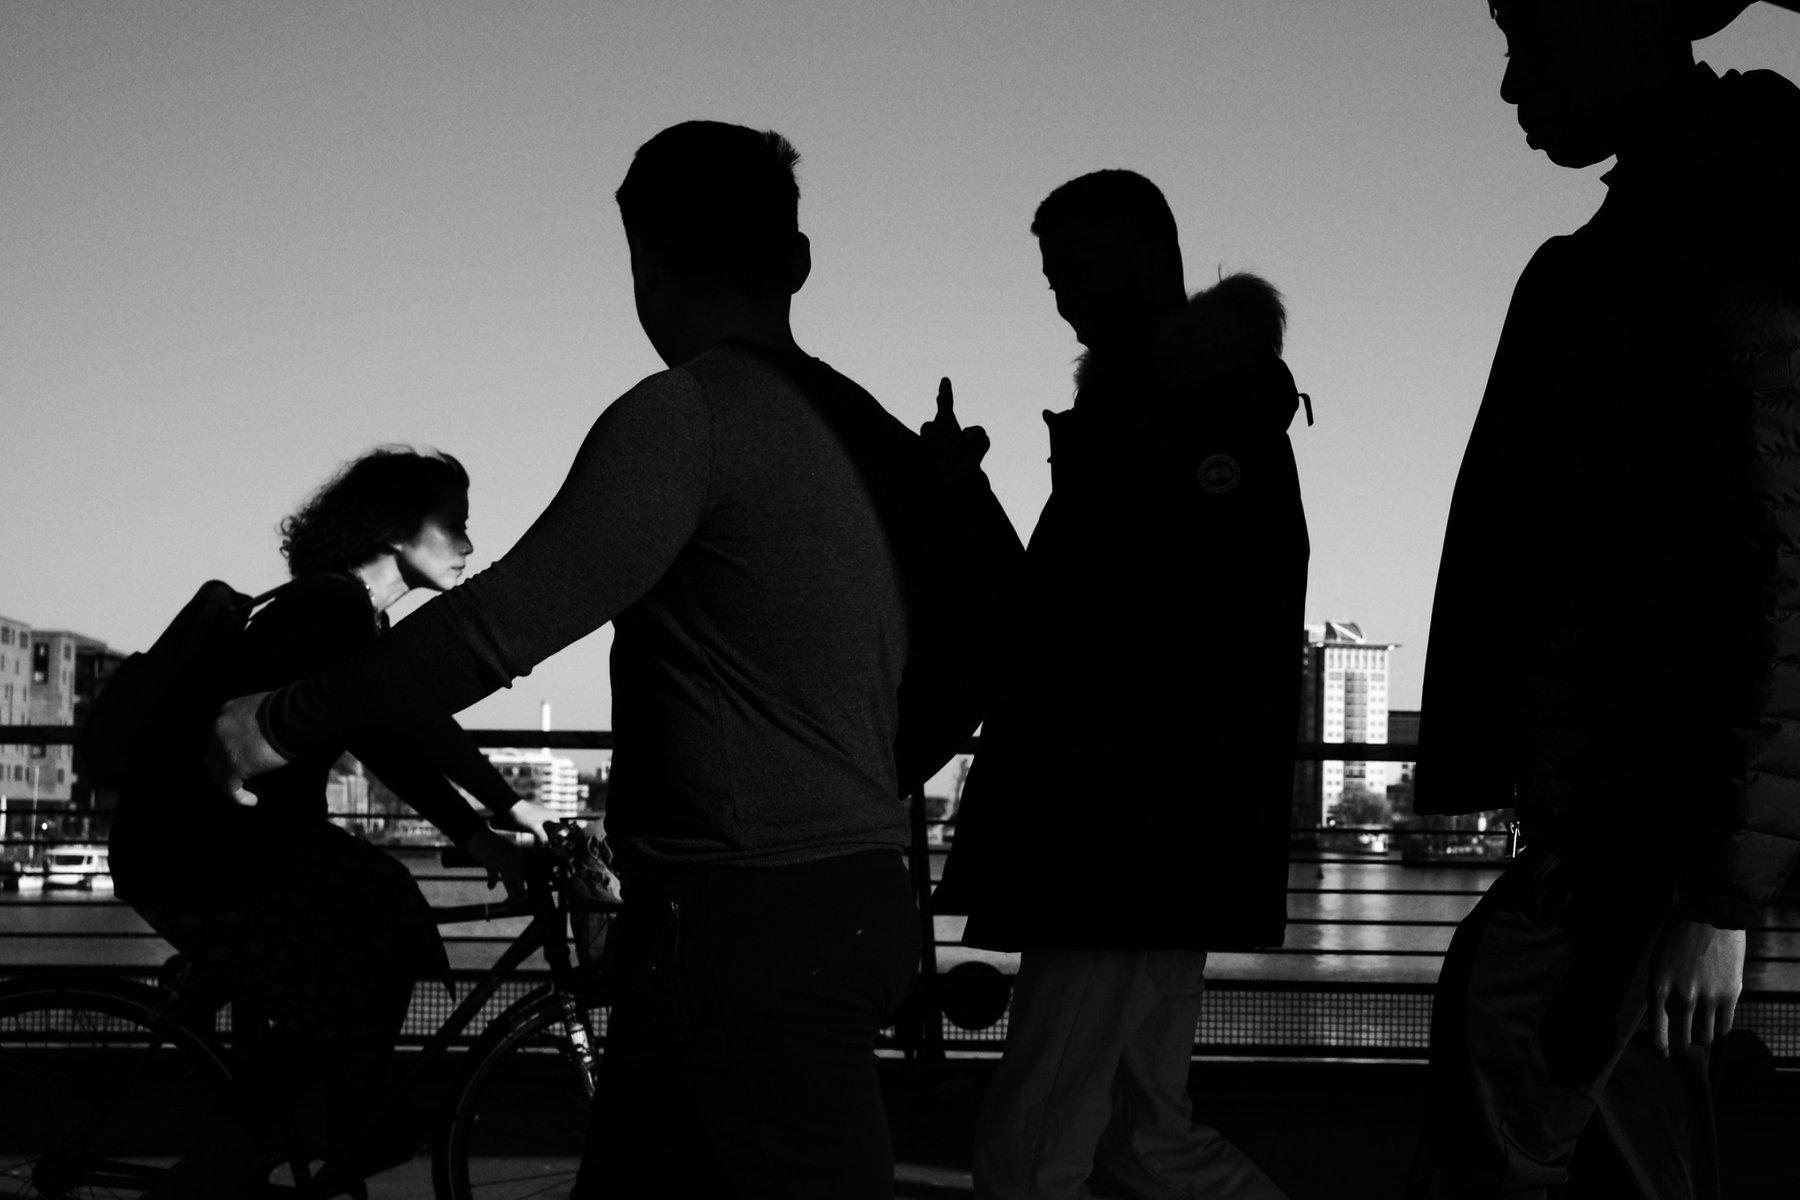 Jean-Pierre Damen urban and street photography - 01_L1009958.jpg